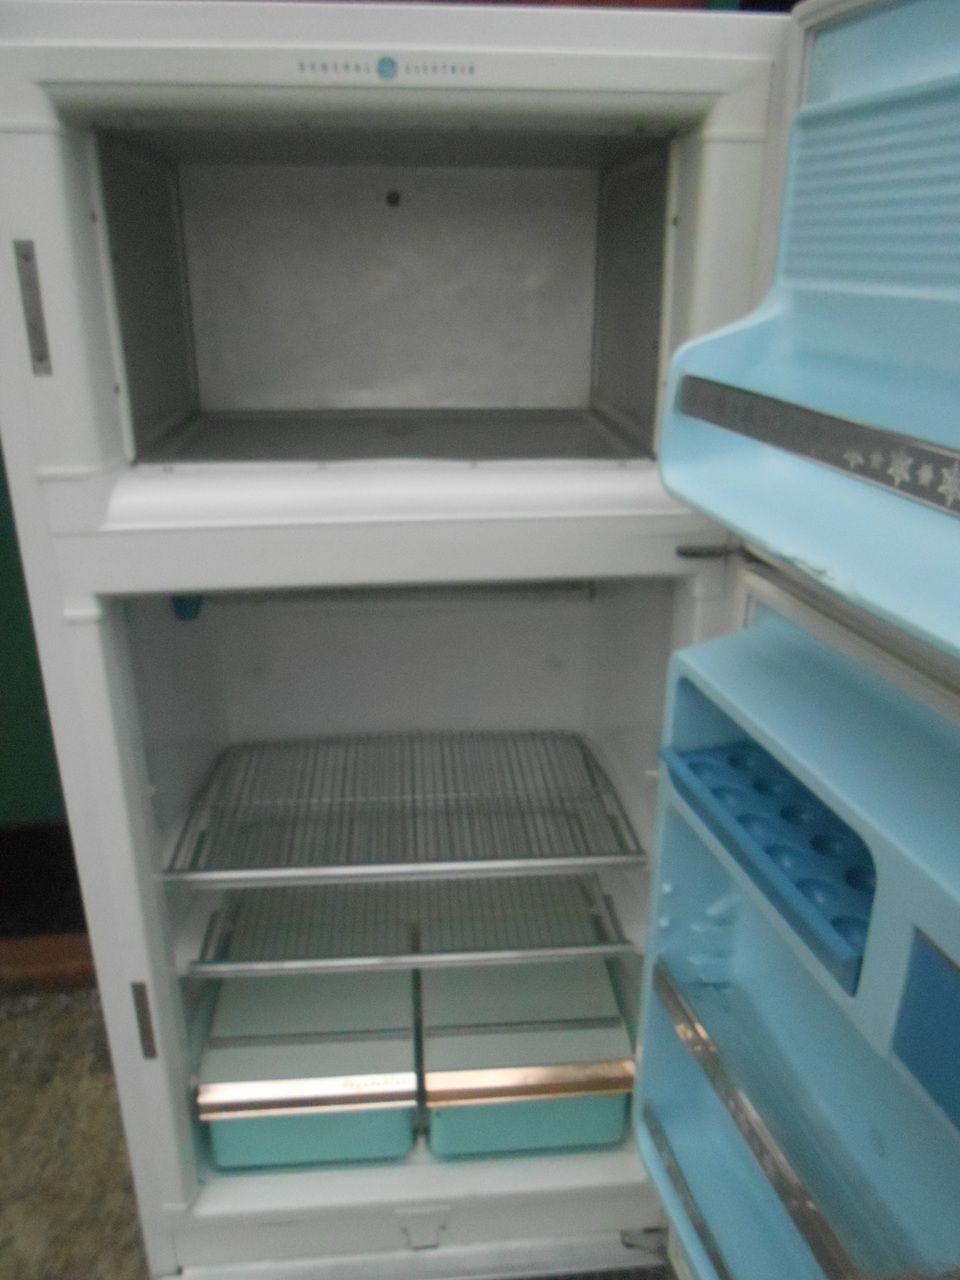 Appliance City VINTAGE GE REFRIGERATOR TOP FREEZER